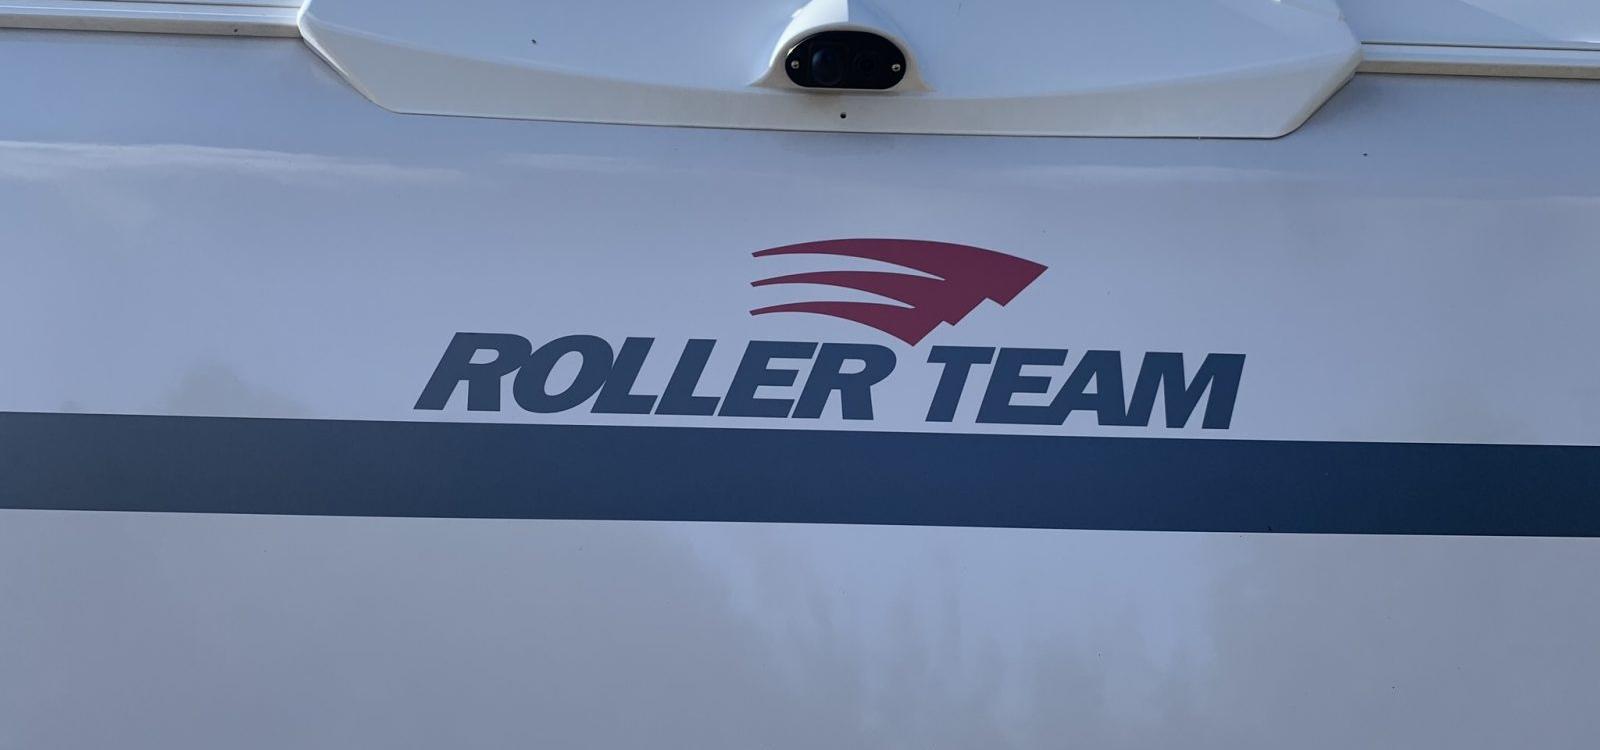 Juno - Rollerteam 696